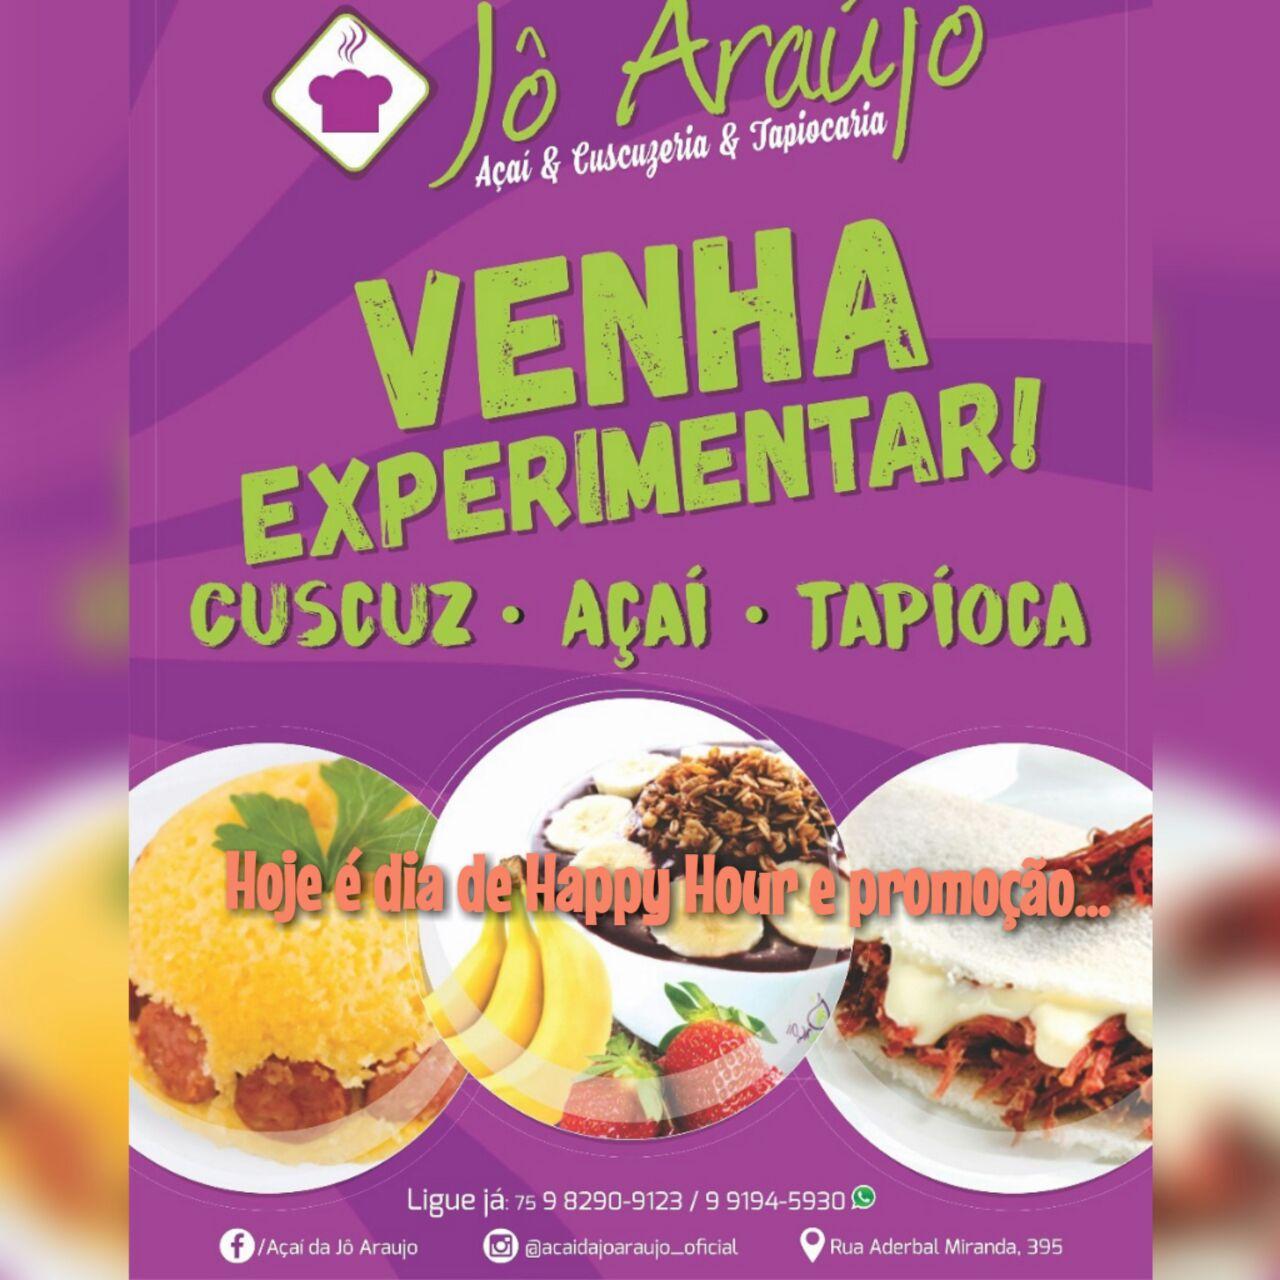 JÔ ARAÚJO - AÇAI, CUSCUZERIA & TAPIOCARIA - DELIVERY 98290-9123